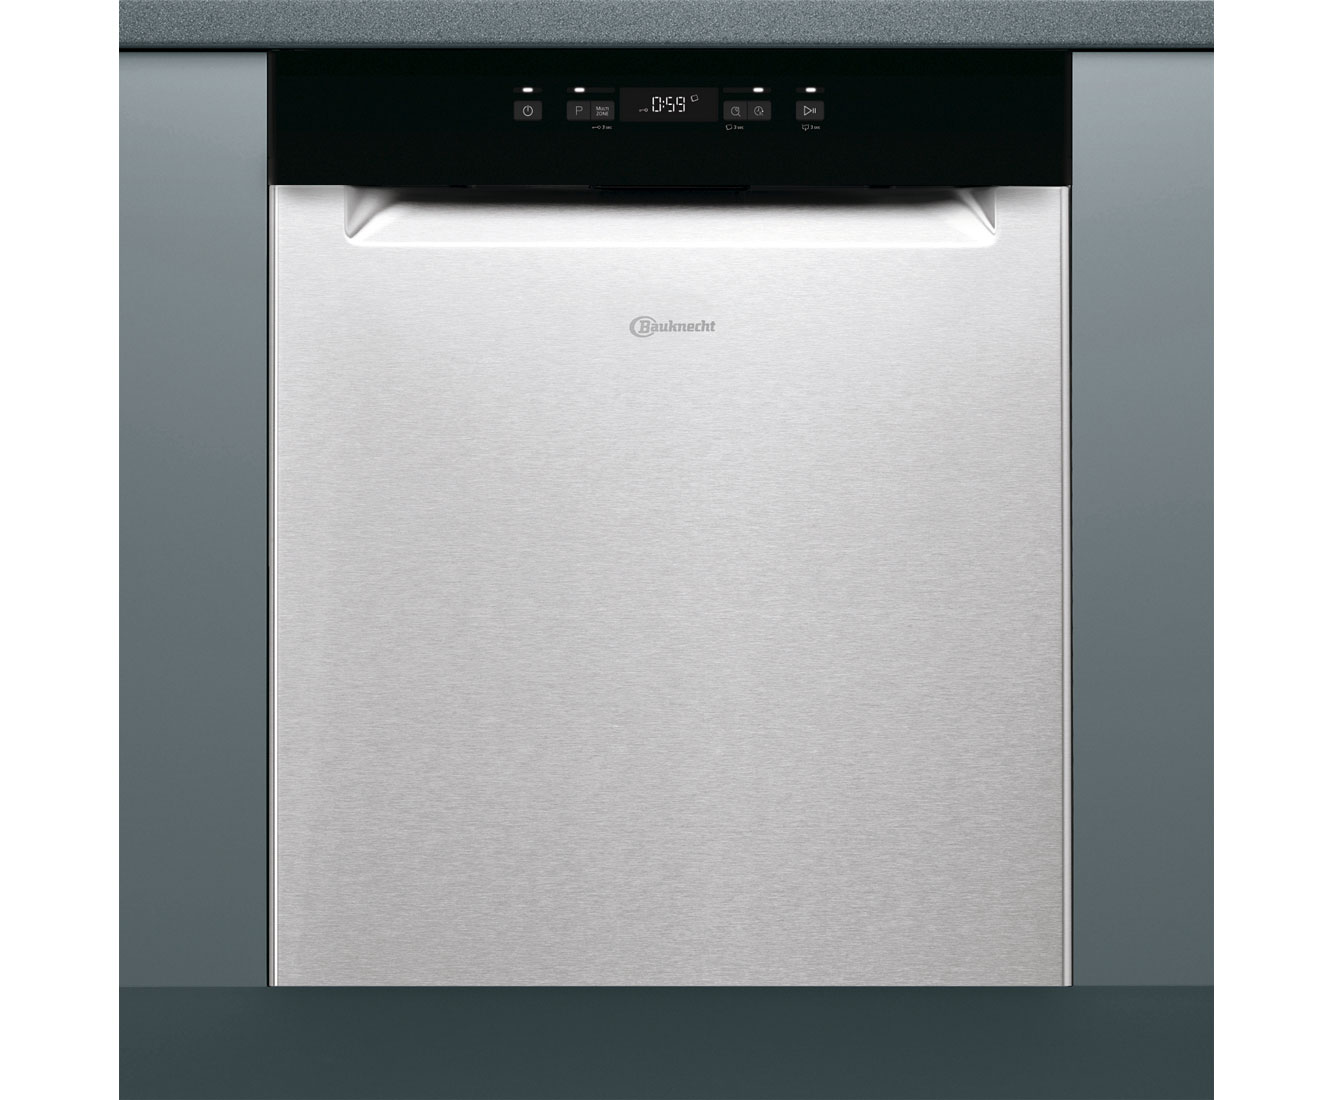 Minibar Kühlschrank Einbau : ᐅ abschließbarer kühlschrank ᐅ sichere abschließbare kühlschränke